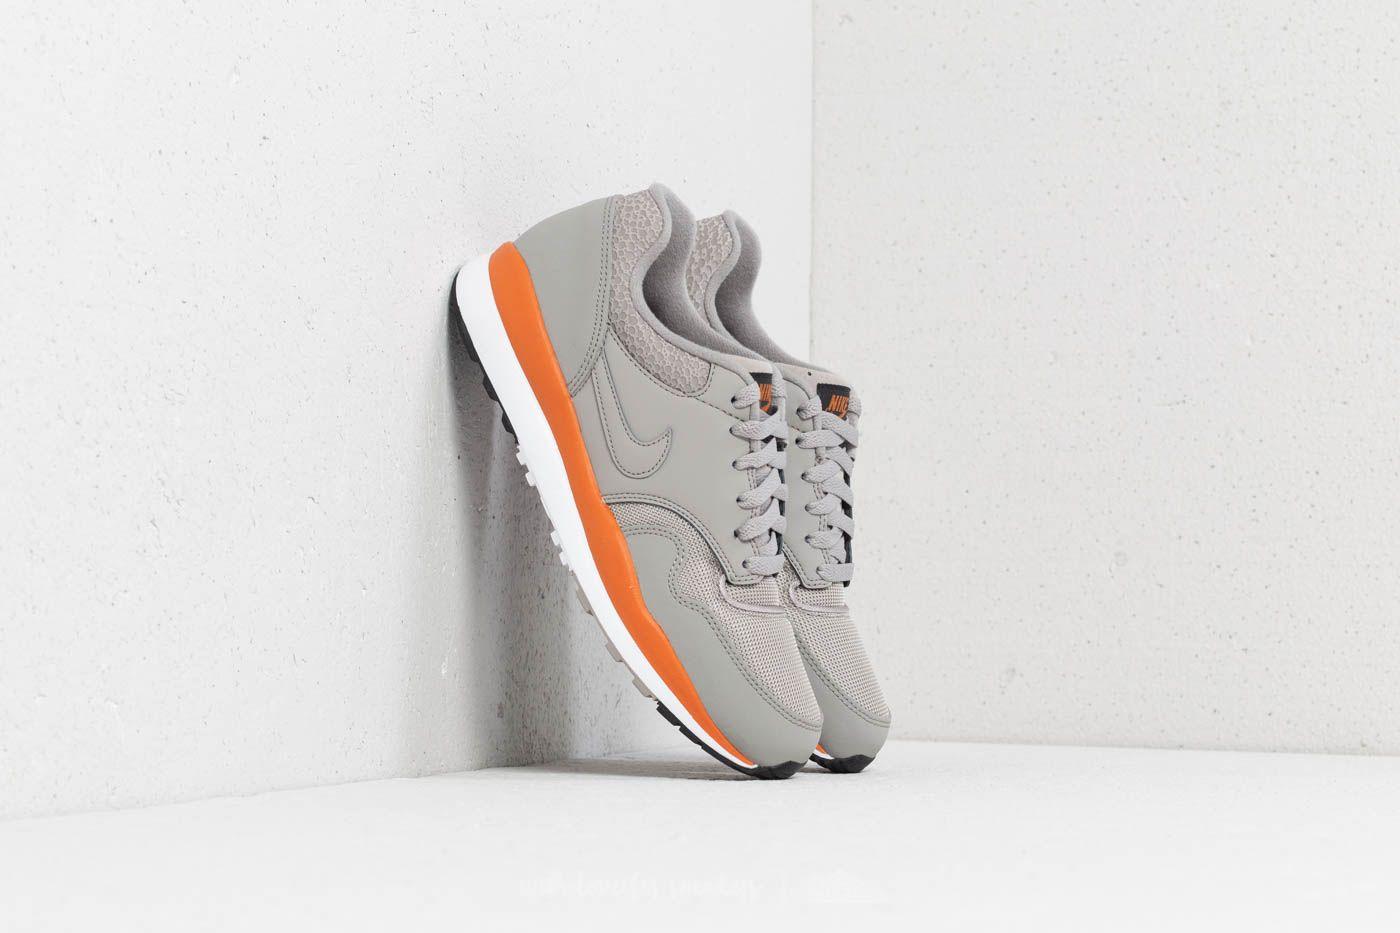 Nike Air Safari Cobblestone/ Cobblestone za skvělou cenu 2 690 Kč koupíte na Footshop.cz